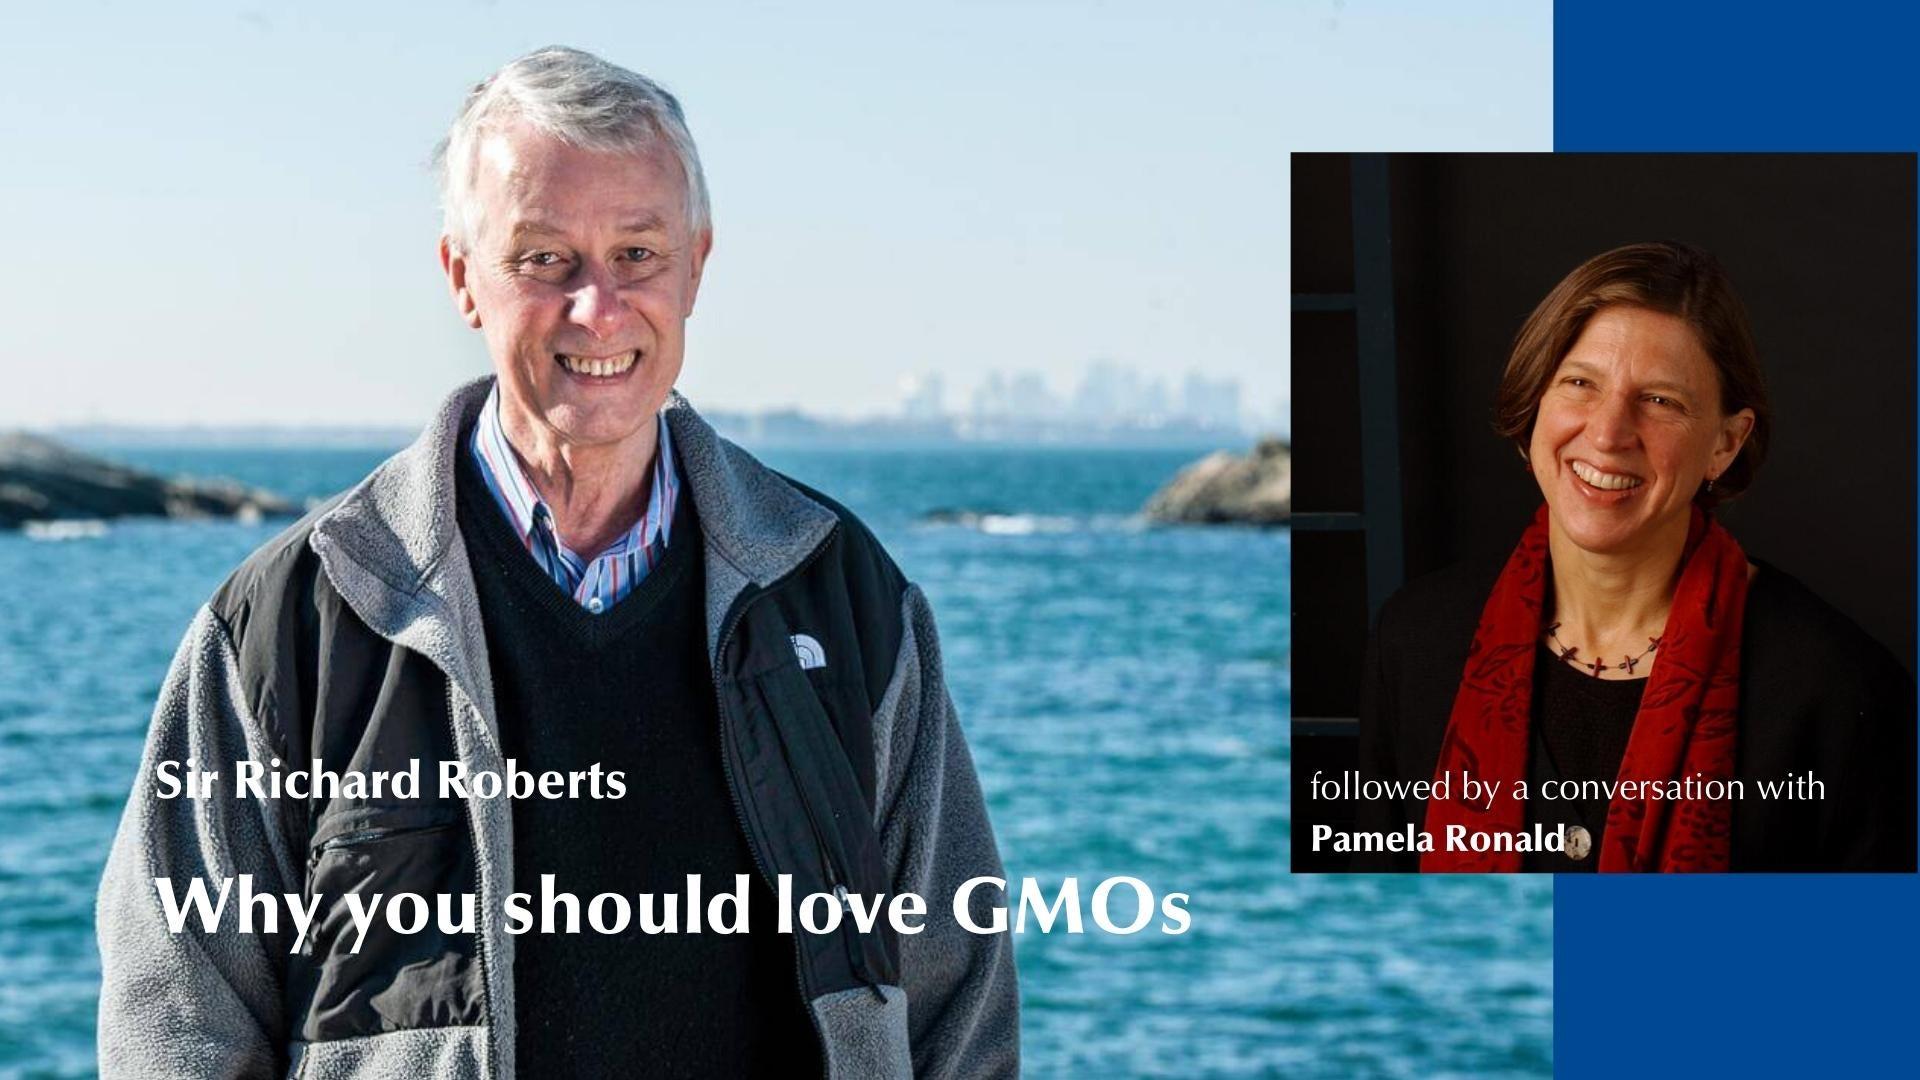 Rich Roberts and Pamela Ronald discuss GMOs